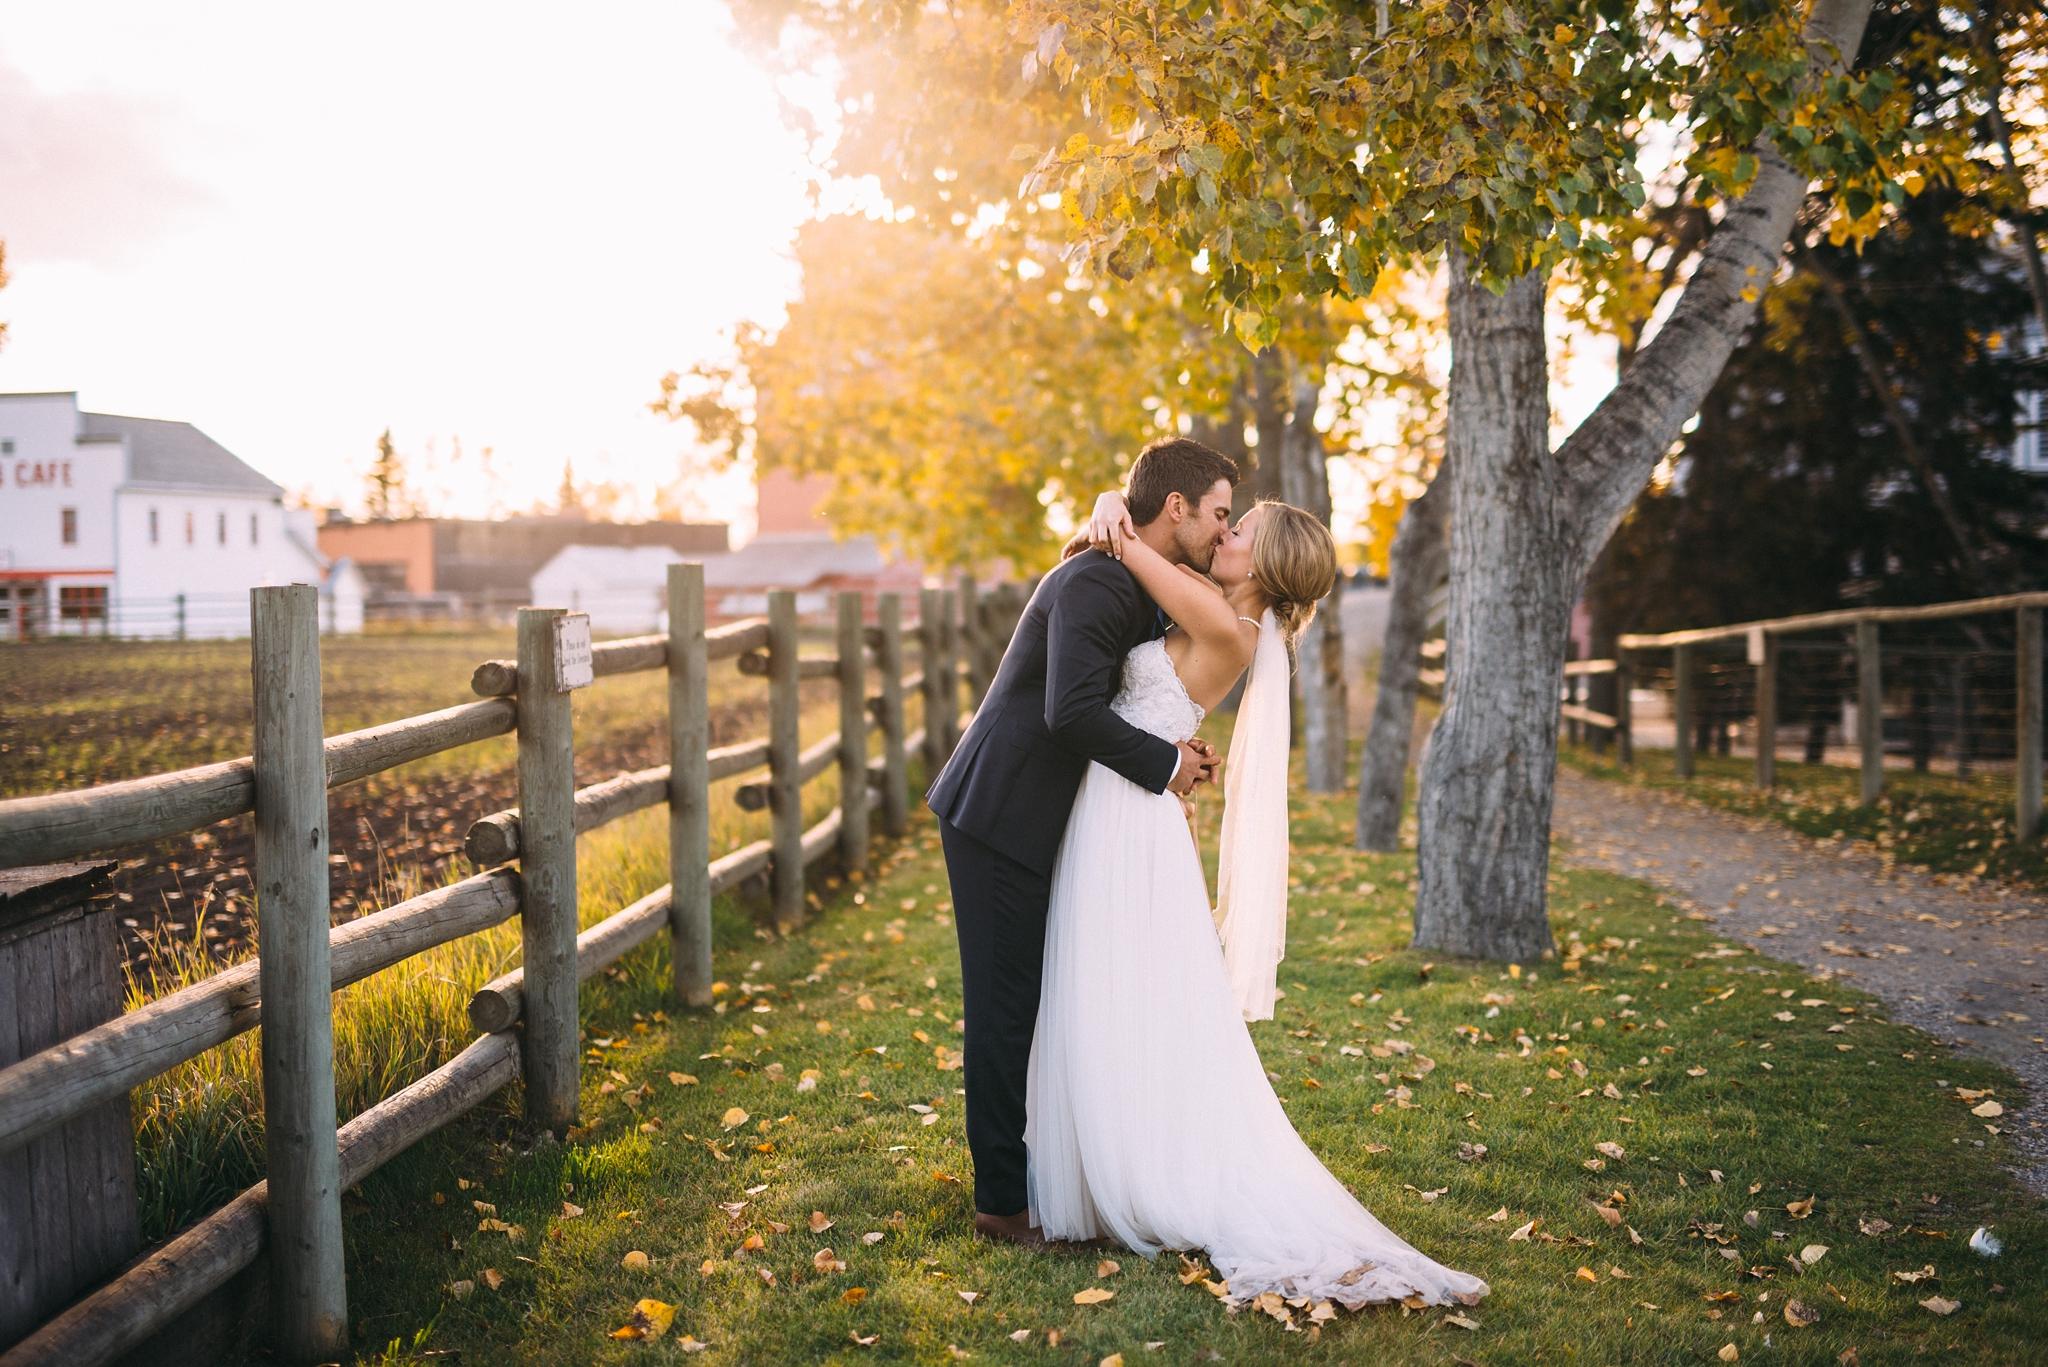 kaihla_tonai_intimate_wedding_elopement_photographer_2905